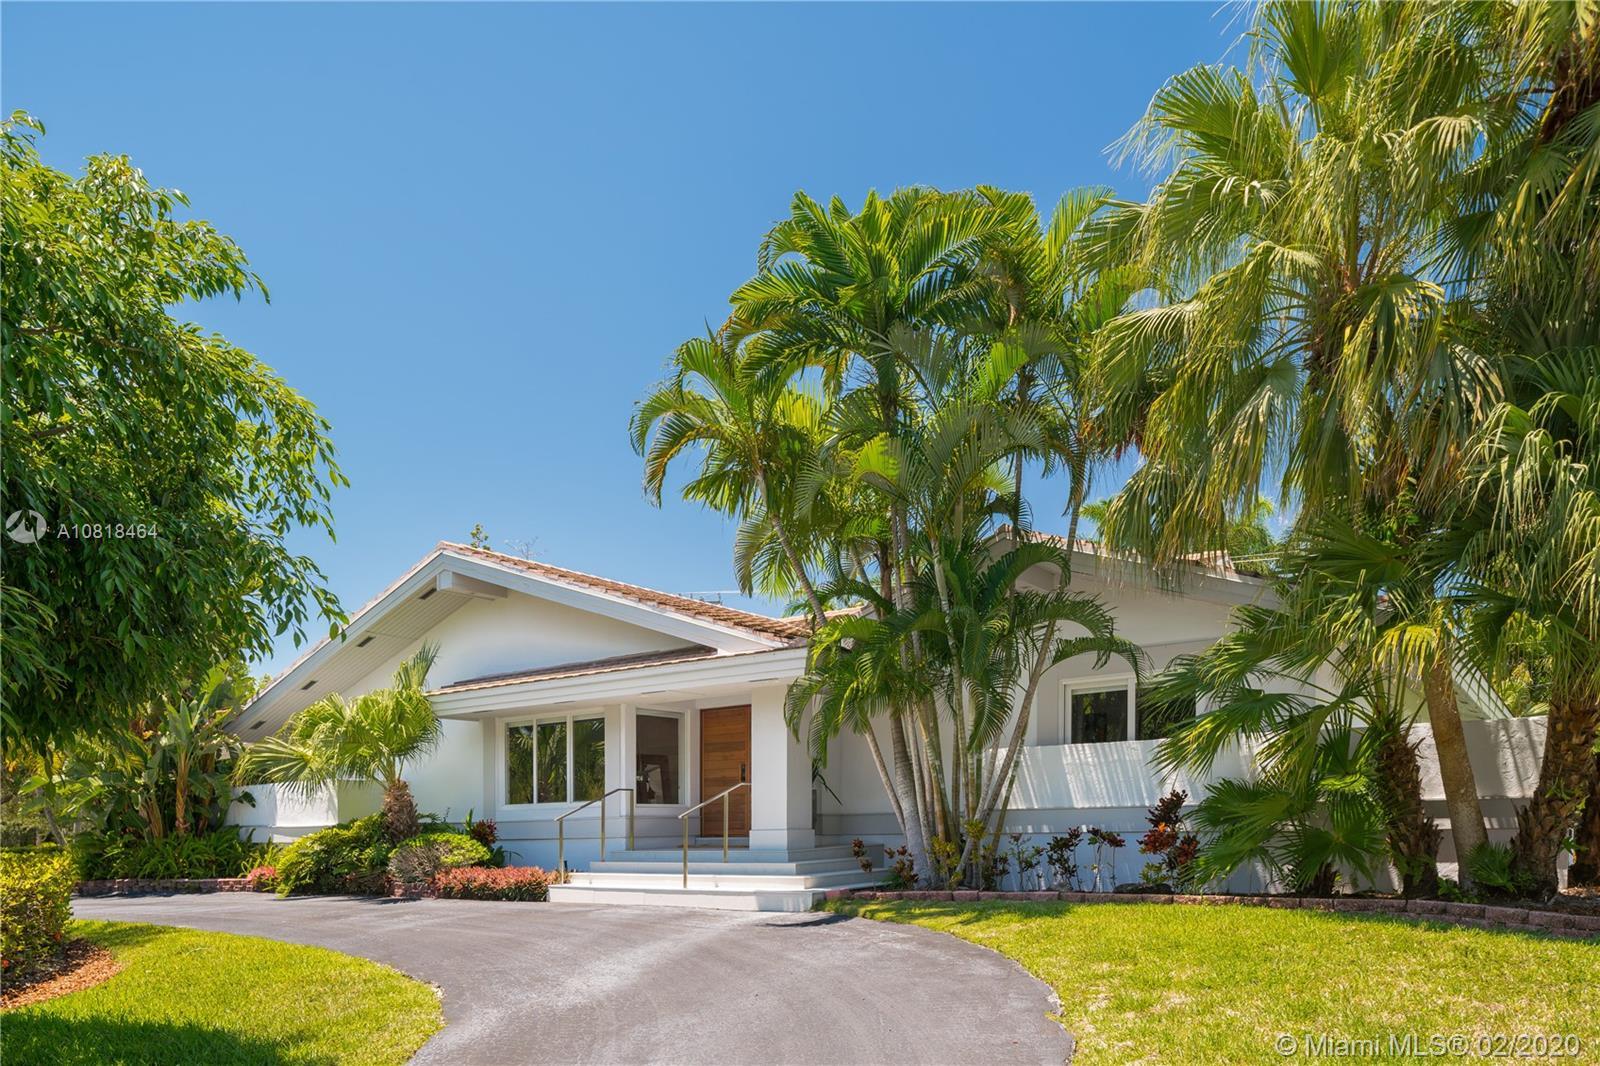 495 Campana Ave, Coral Gables, FL 33156